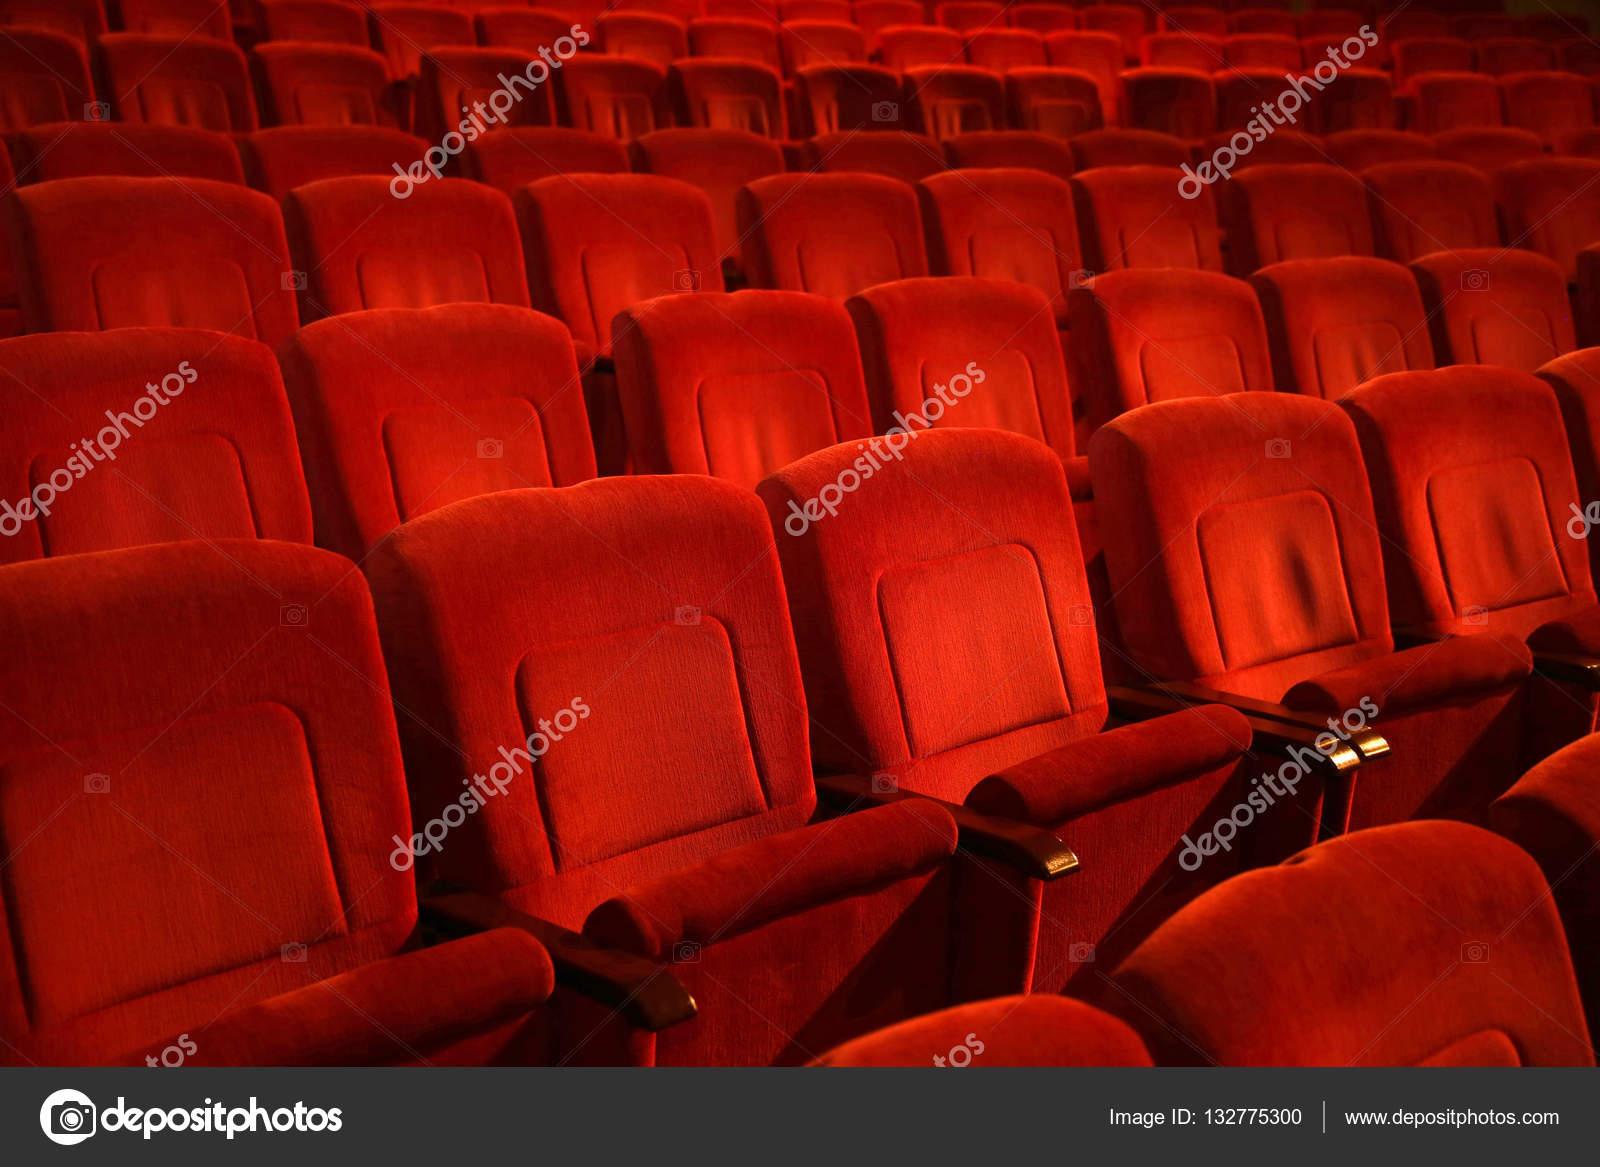 Teatro Le Sedie.Sedie Di Teatro Film Vuota Nella Riga Colorata Di Rosso